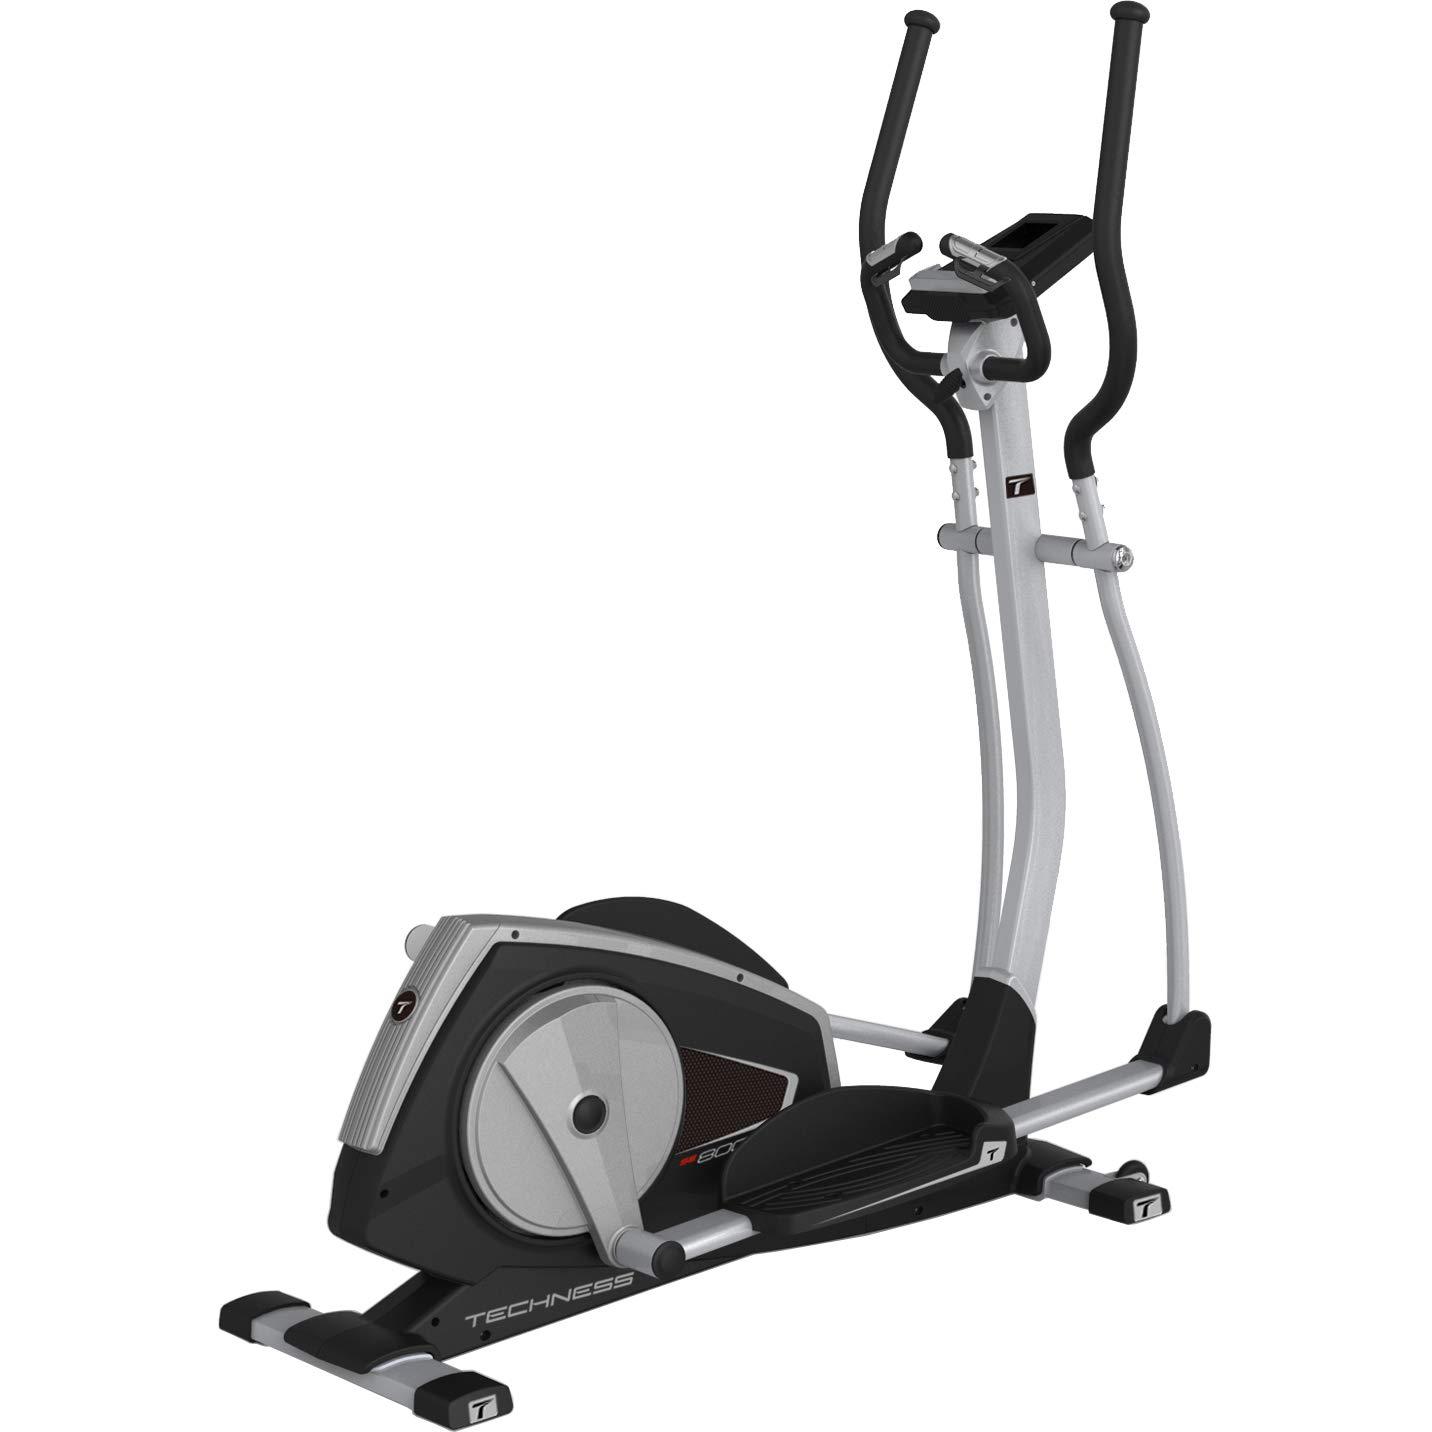 Bicicleta Elíptica Techness SE 800 MP3 2015: Amazon.es: Deportes y aire libre